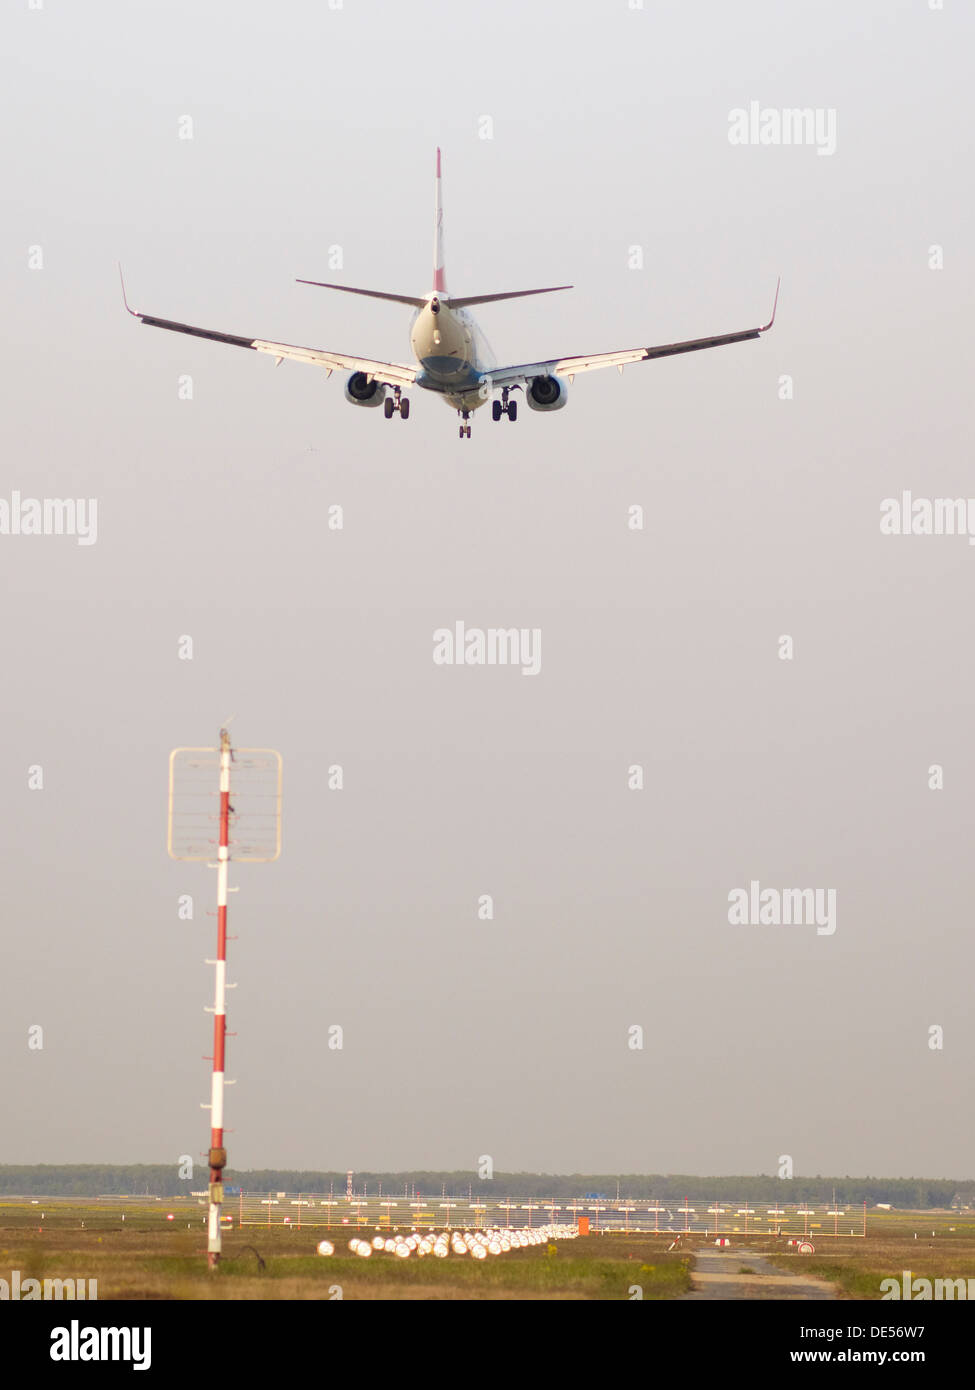 Twin engine jet plane on landing approach, Frankfurt Airport, Frankfurt am Main, Hesse - Stock Image